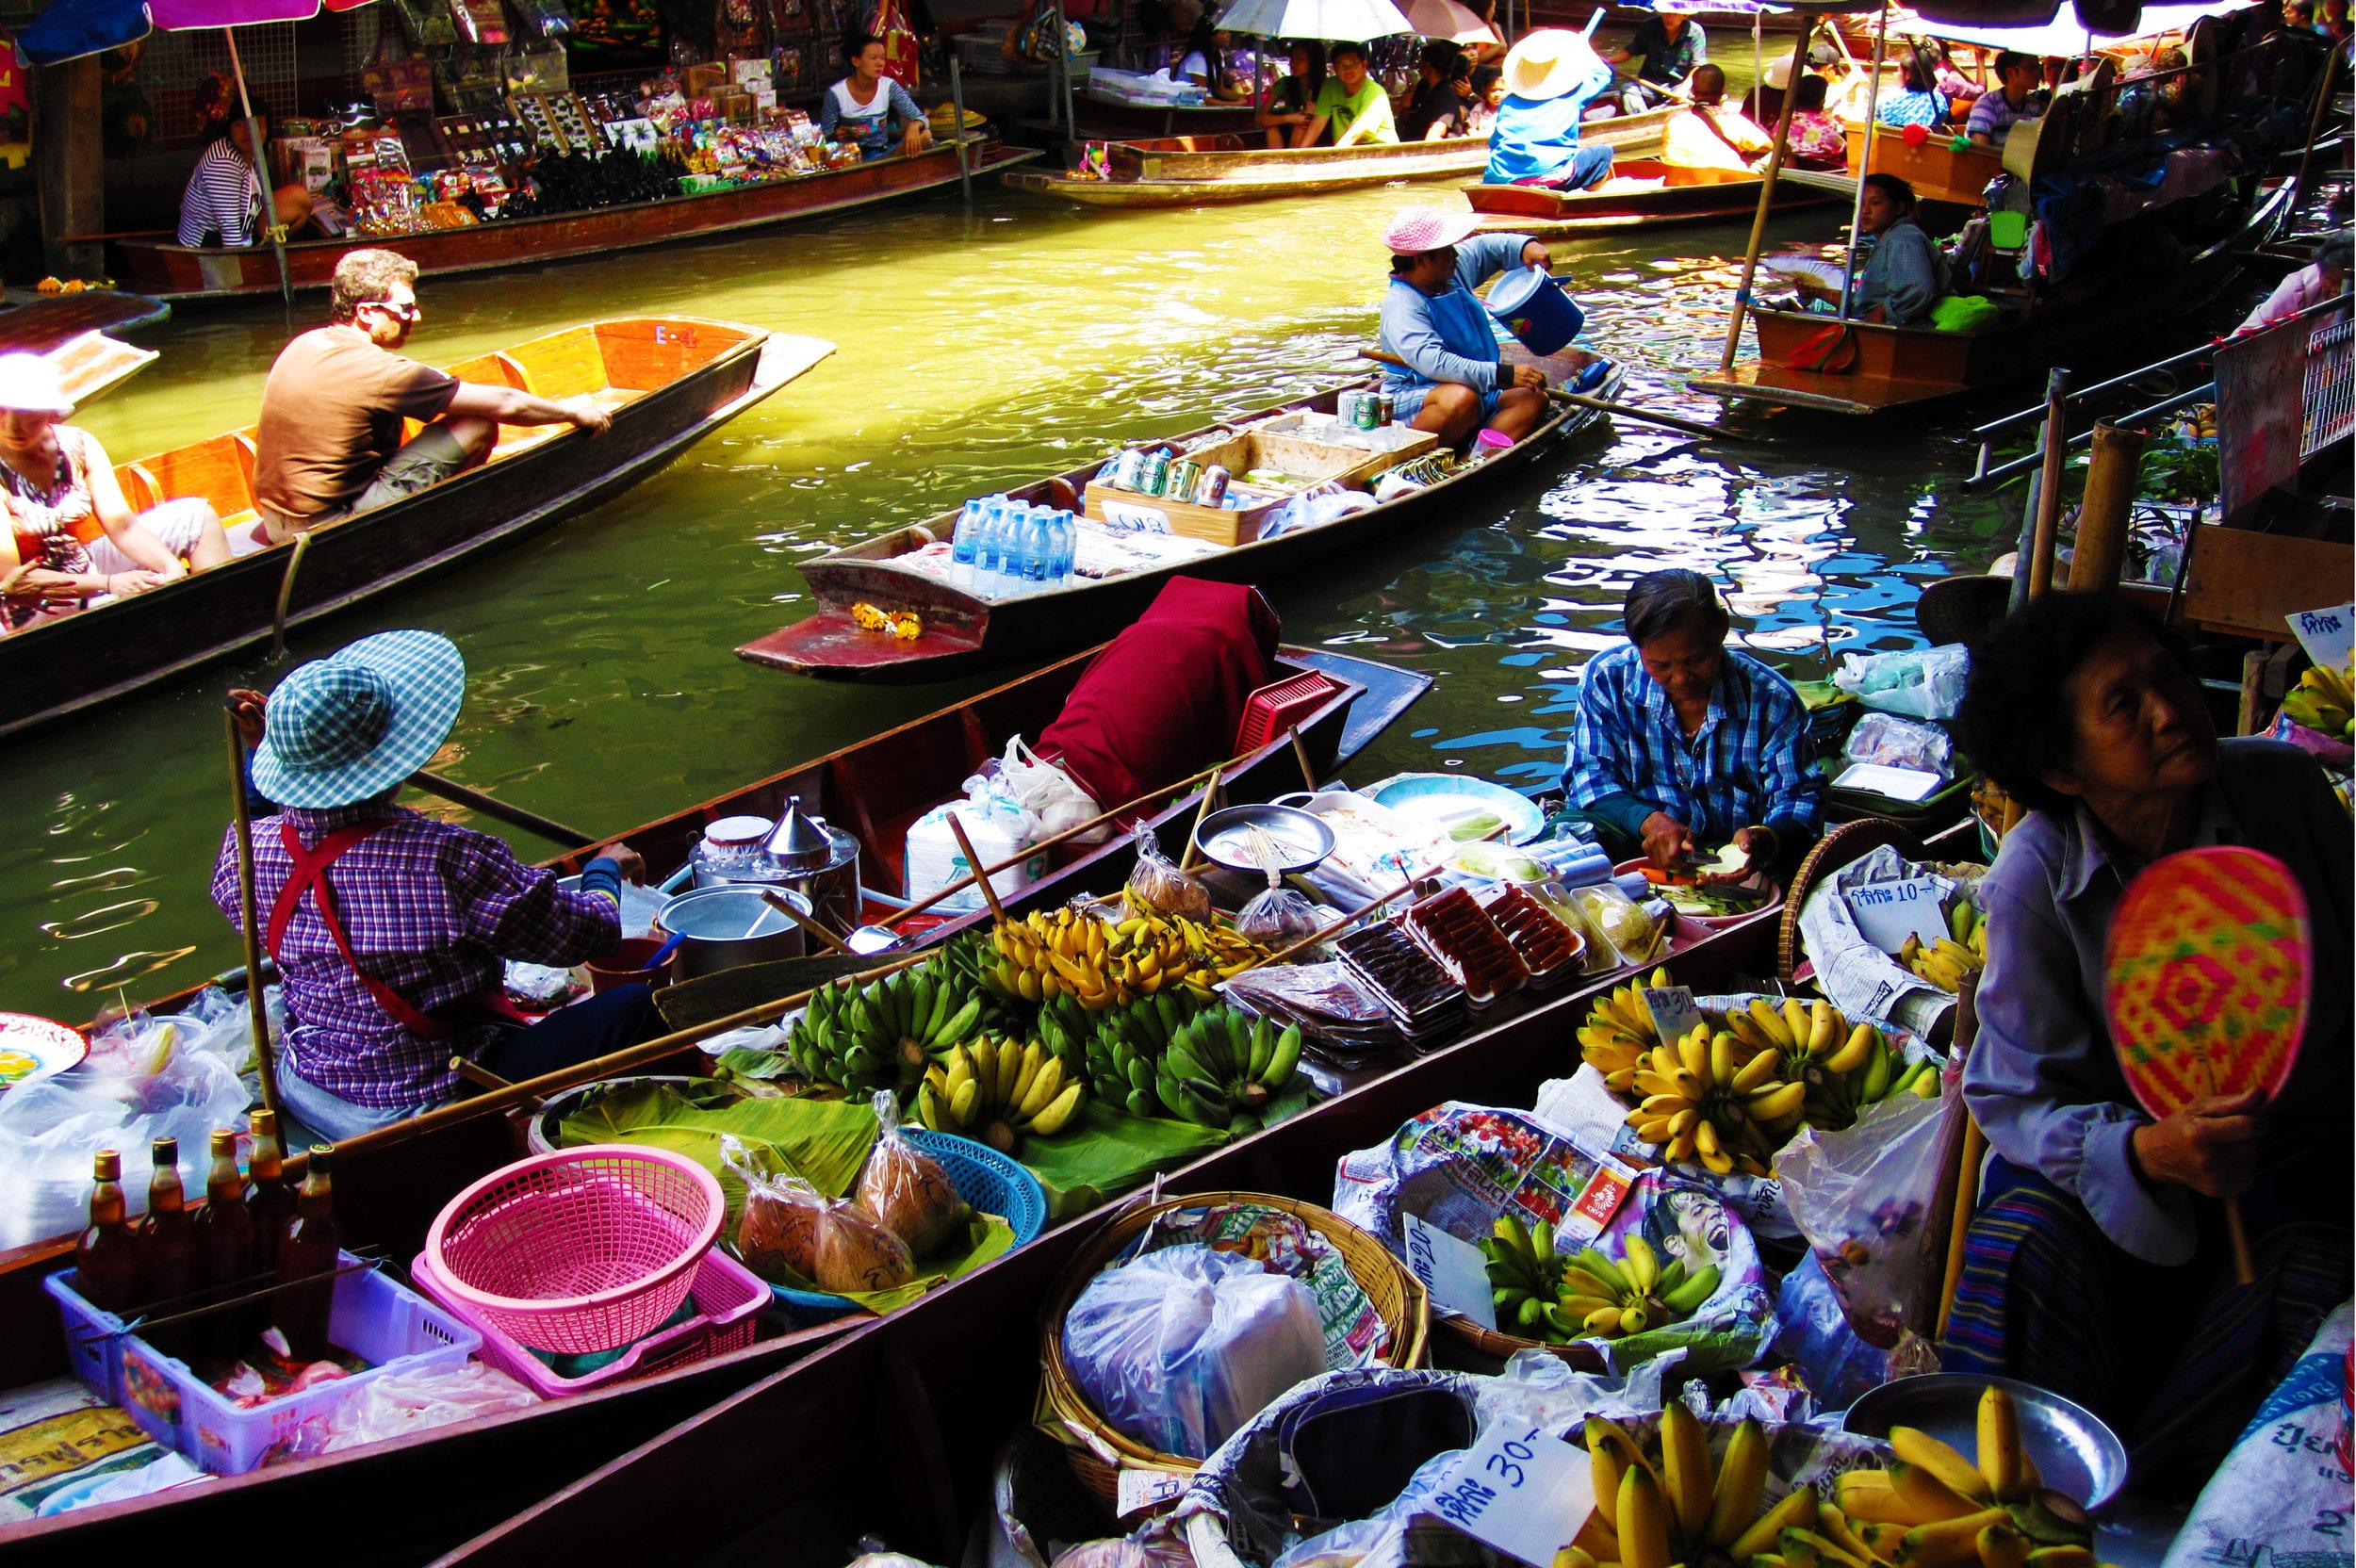 Floating market in Thailand, c. 2011